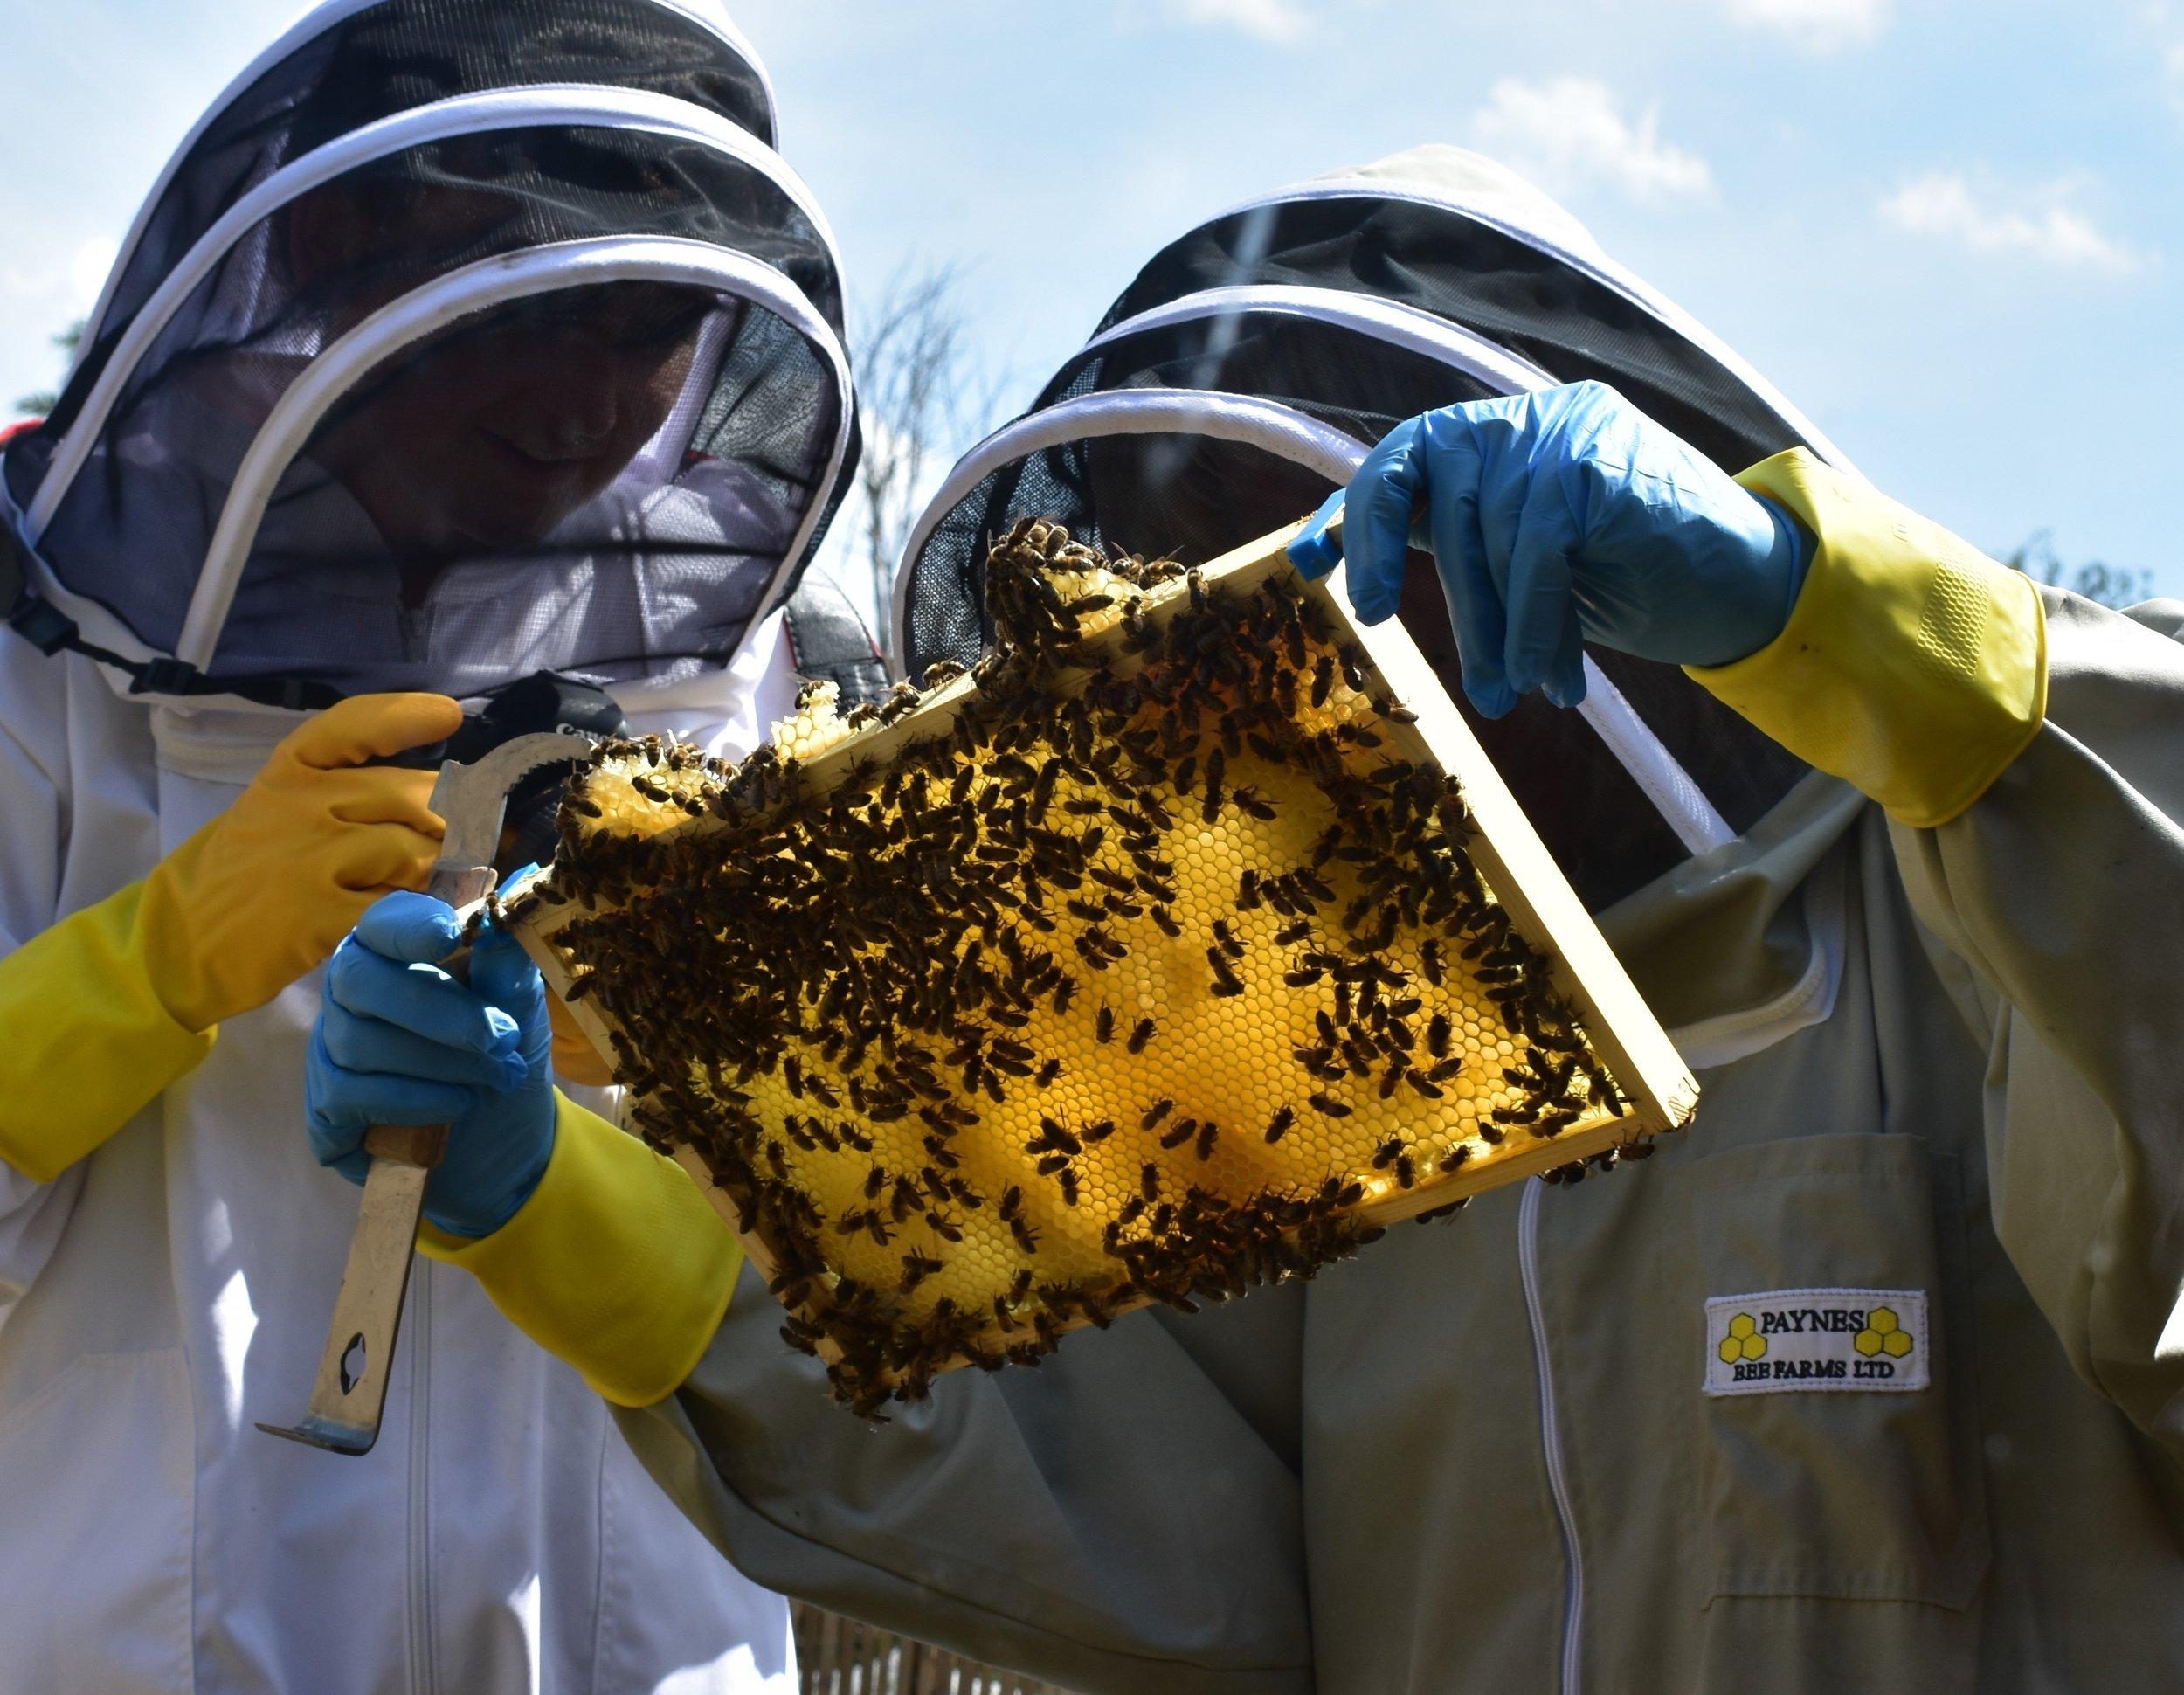 can i keep bees image.jpg